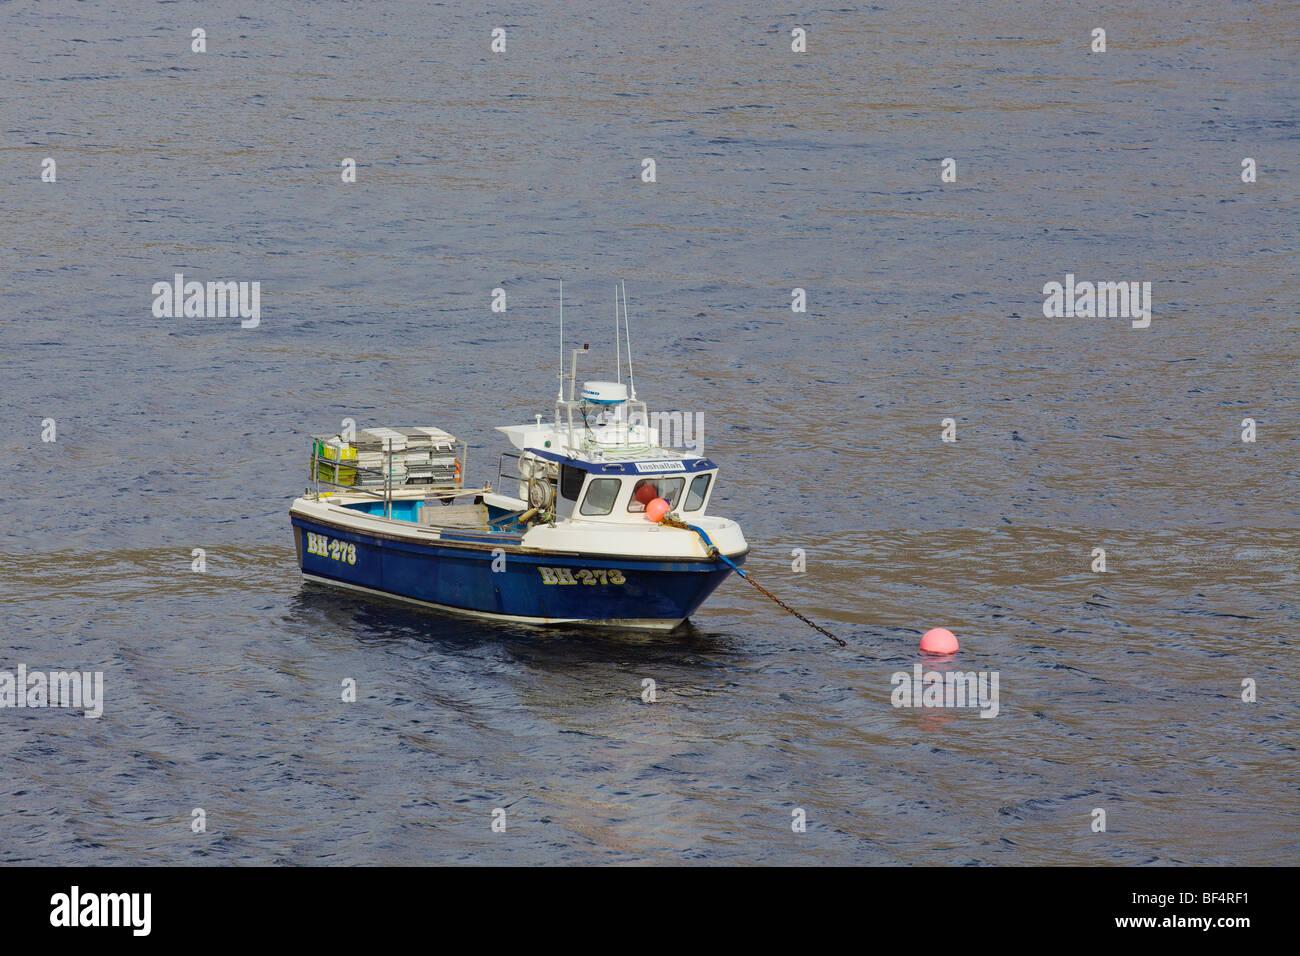 Fishing Boats on Loch Slapin, Isle of Skye, Inner Hebrides, Scotland - Stock Image